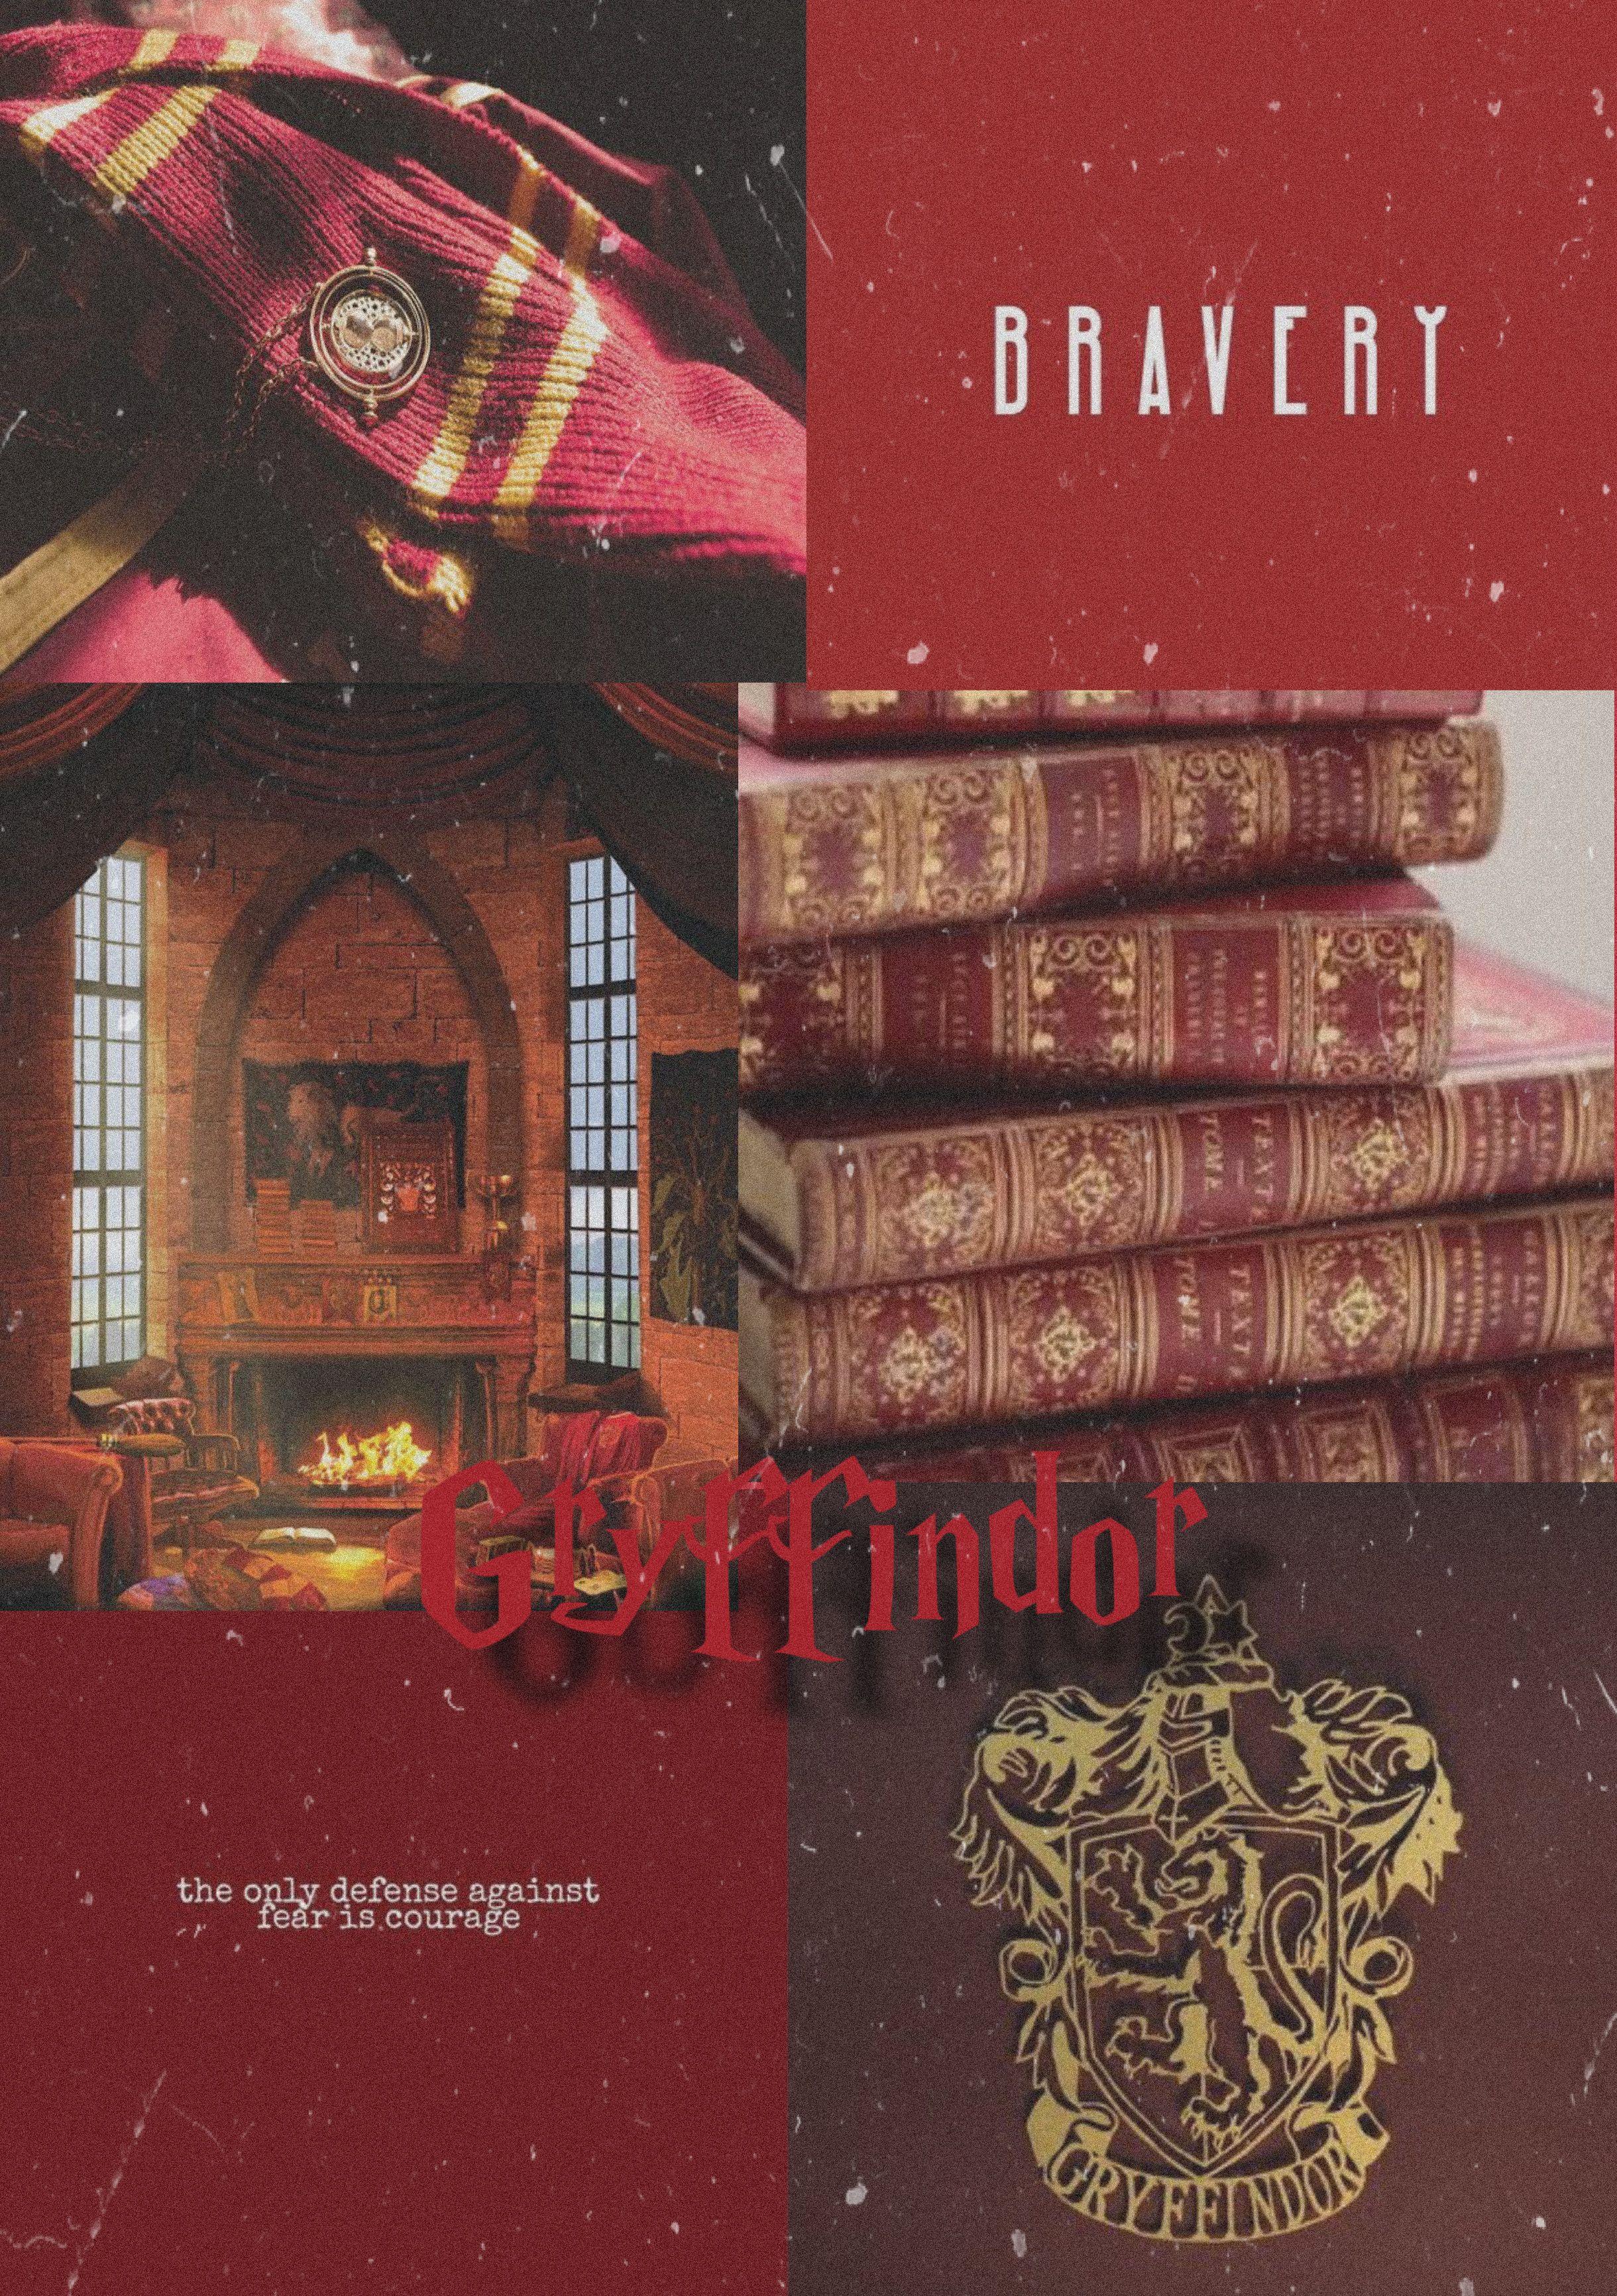 𝗚𝗿𝘆𝗳𝗳𝗶𝗻𝗱𝗼𝗿 𝘄𝗮𝗹𝗹𝗽𝗮𝗽𝗲𝗿 𝗮𝗲𝘀𝘁𝗵𝗲𝘁𝗶𝗰 Gryffindor Aesthetic Gryffindor Pride Gryffindor